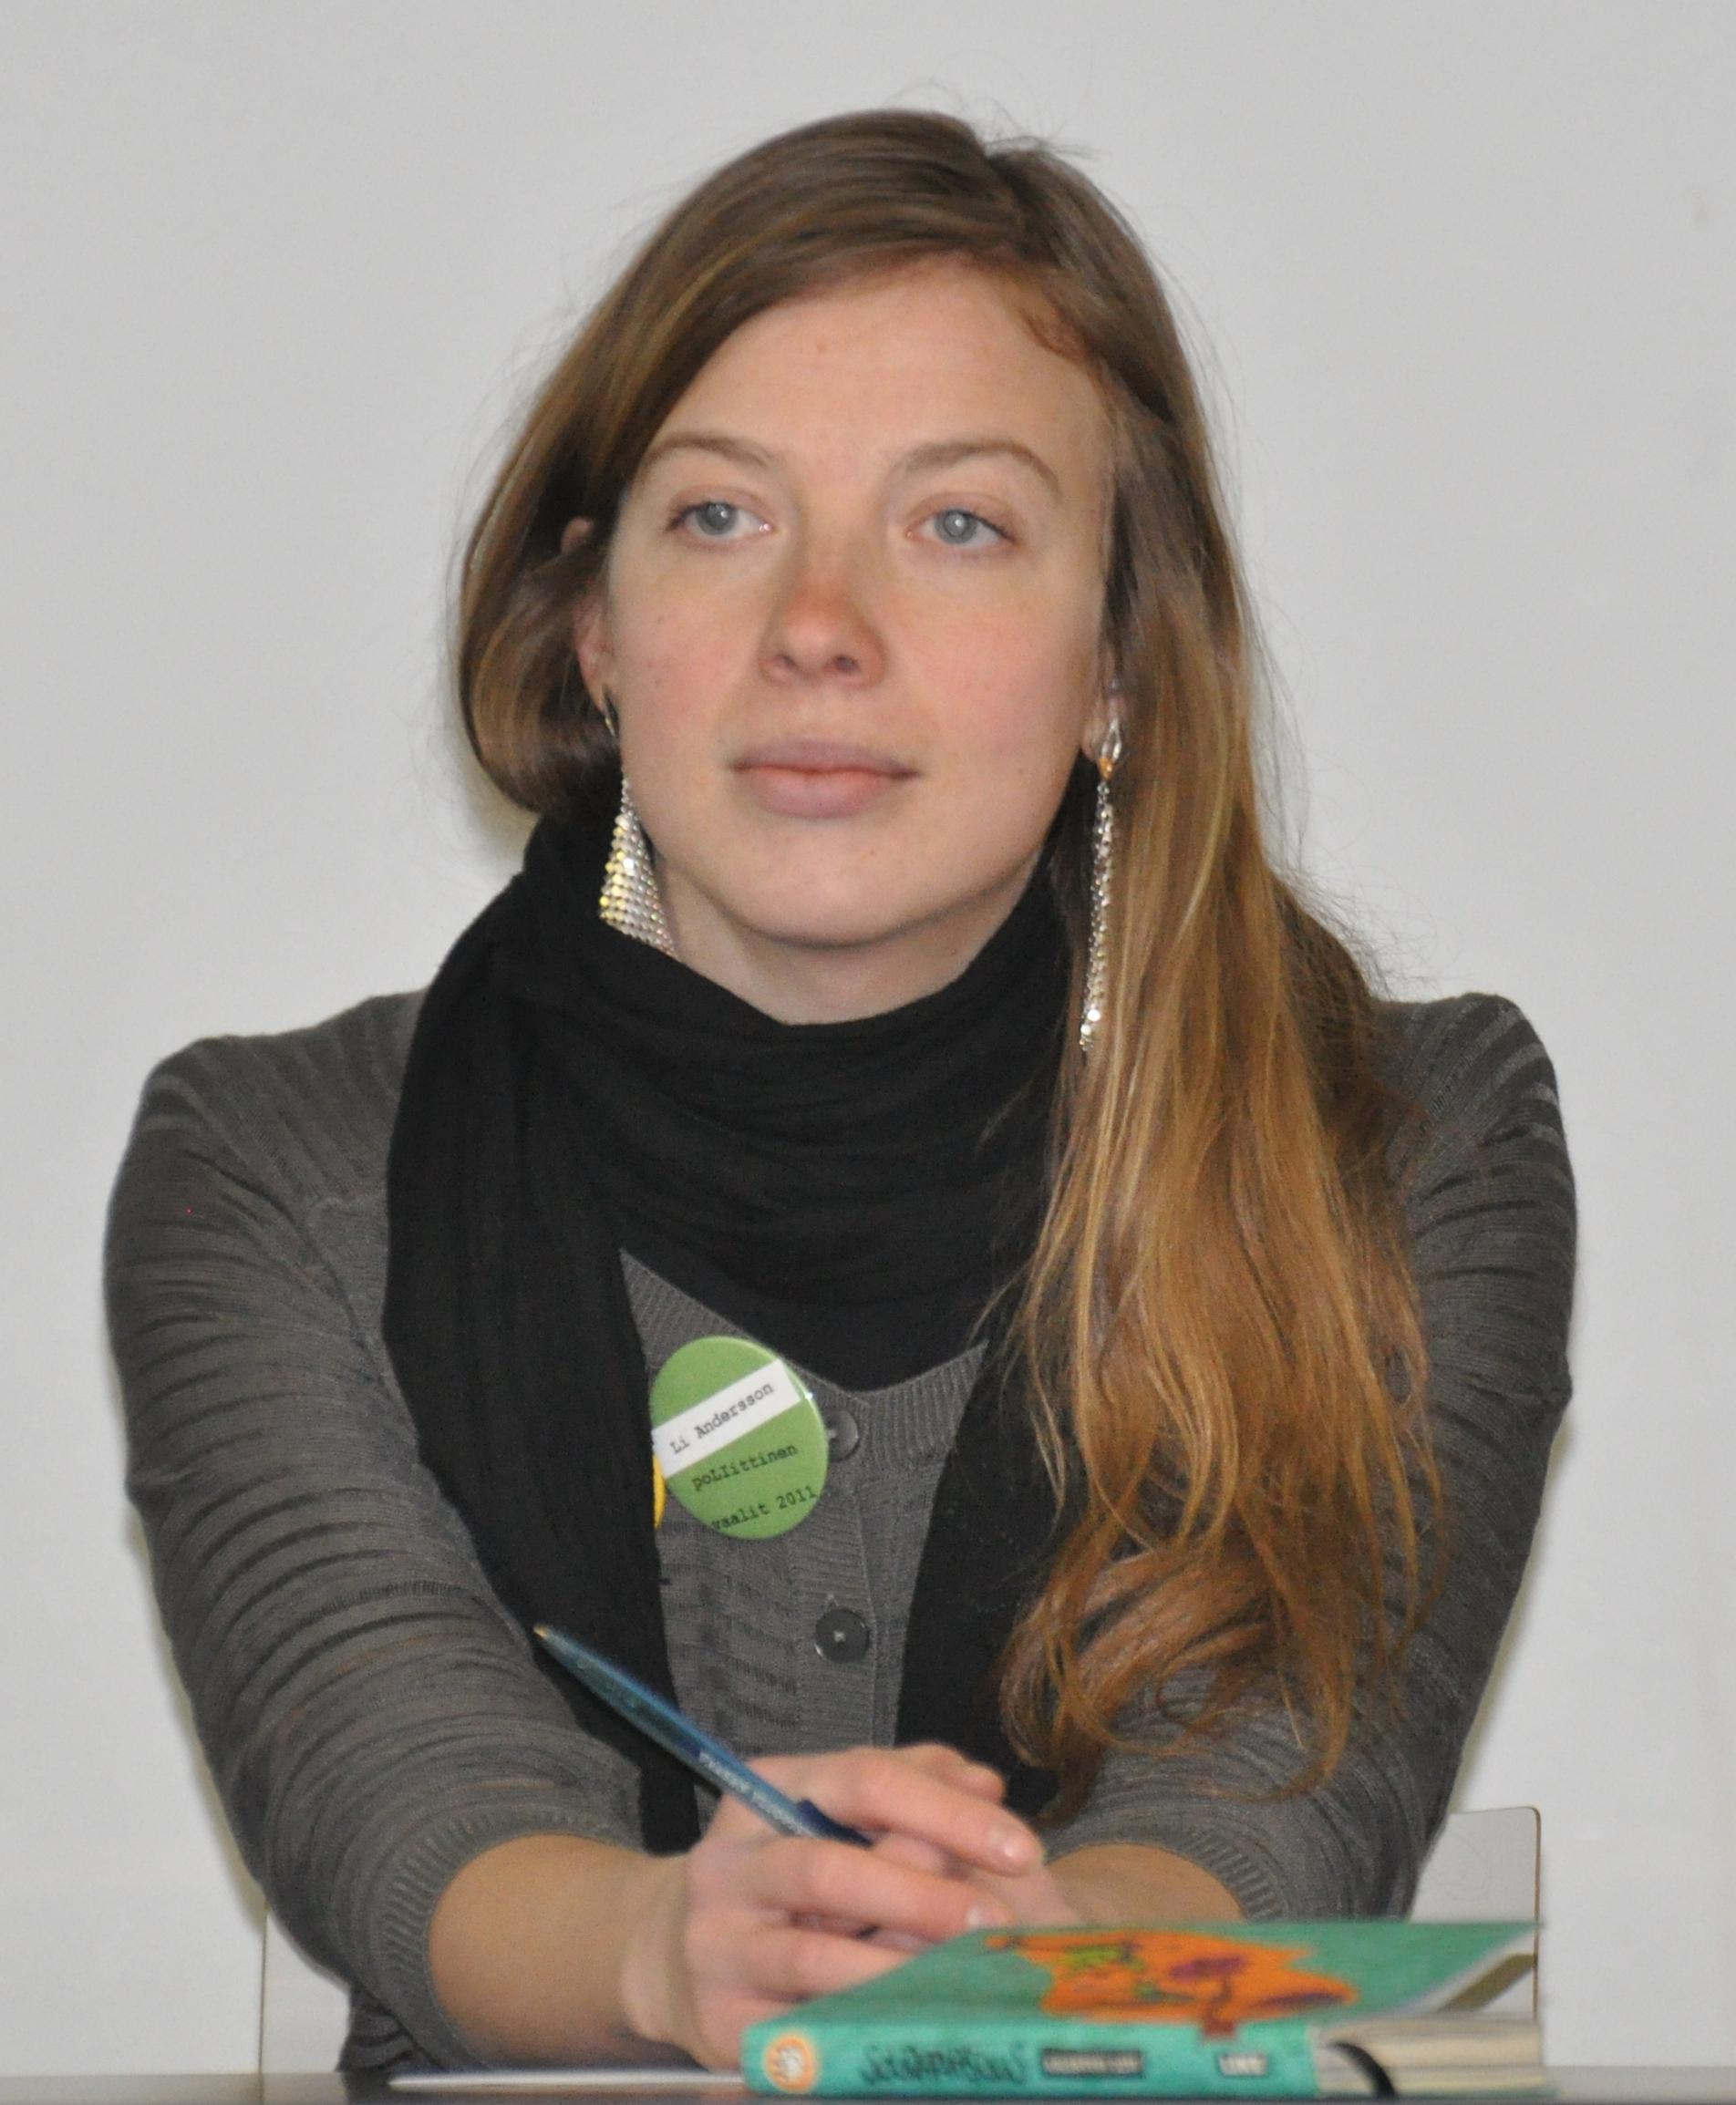 Li Anderson